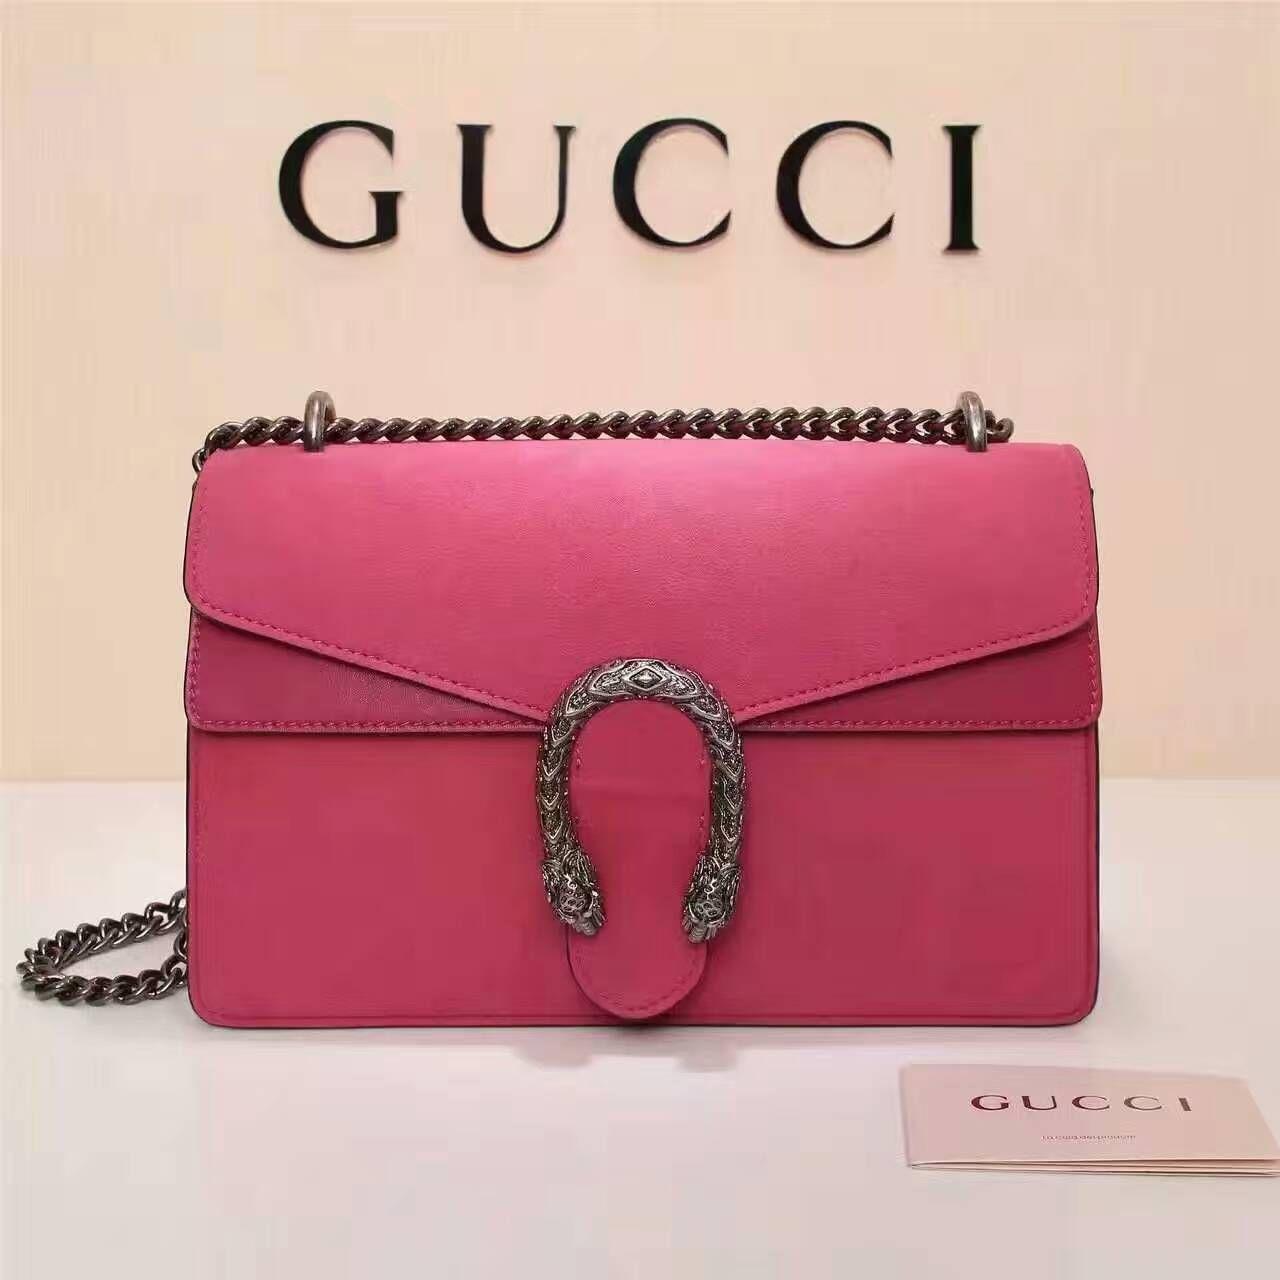 856eda84aec Gucci Dionysus suede shoulder bag 400249-1 size 28x18x9cm G4  whatsapp +8615503787453